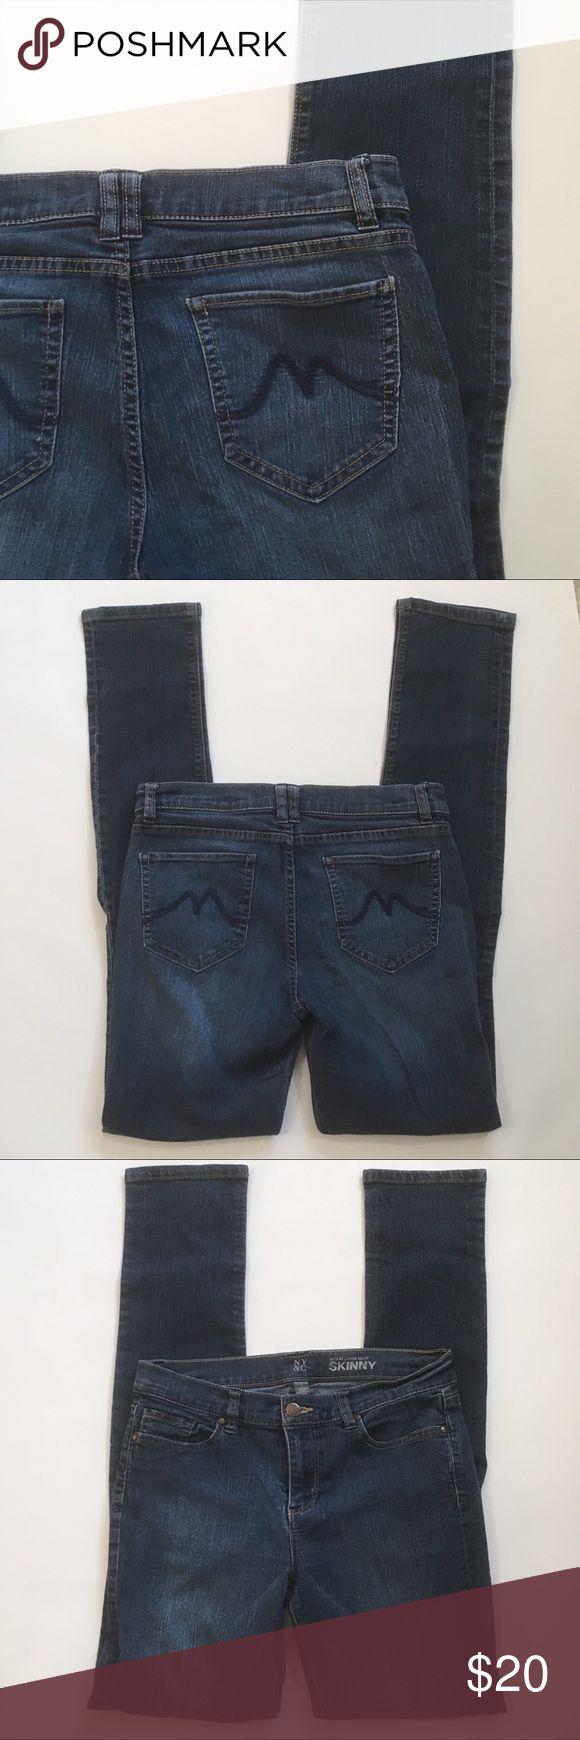 Jeans latzhose damen new yorker